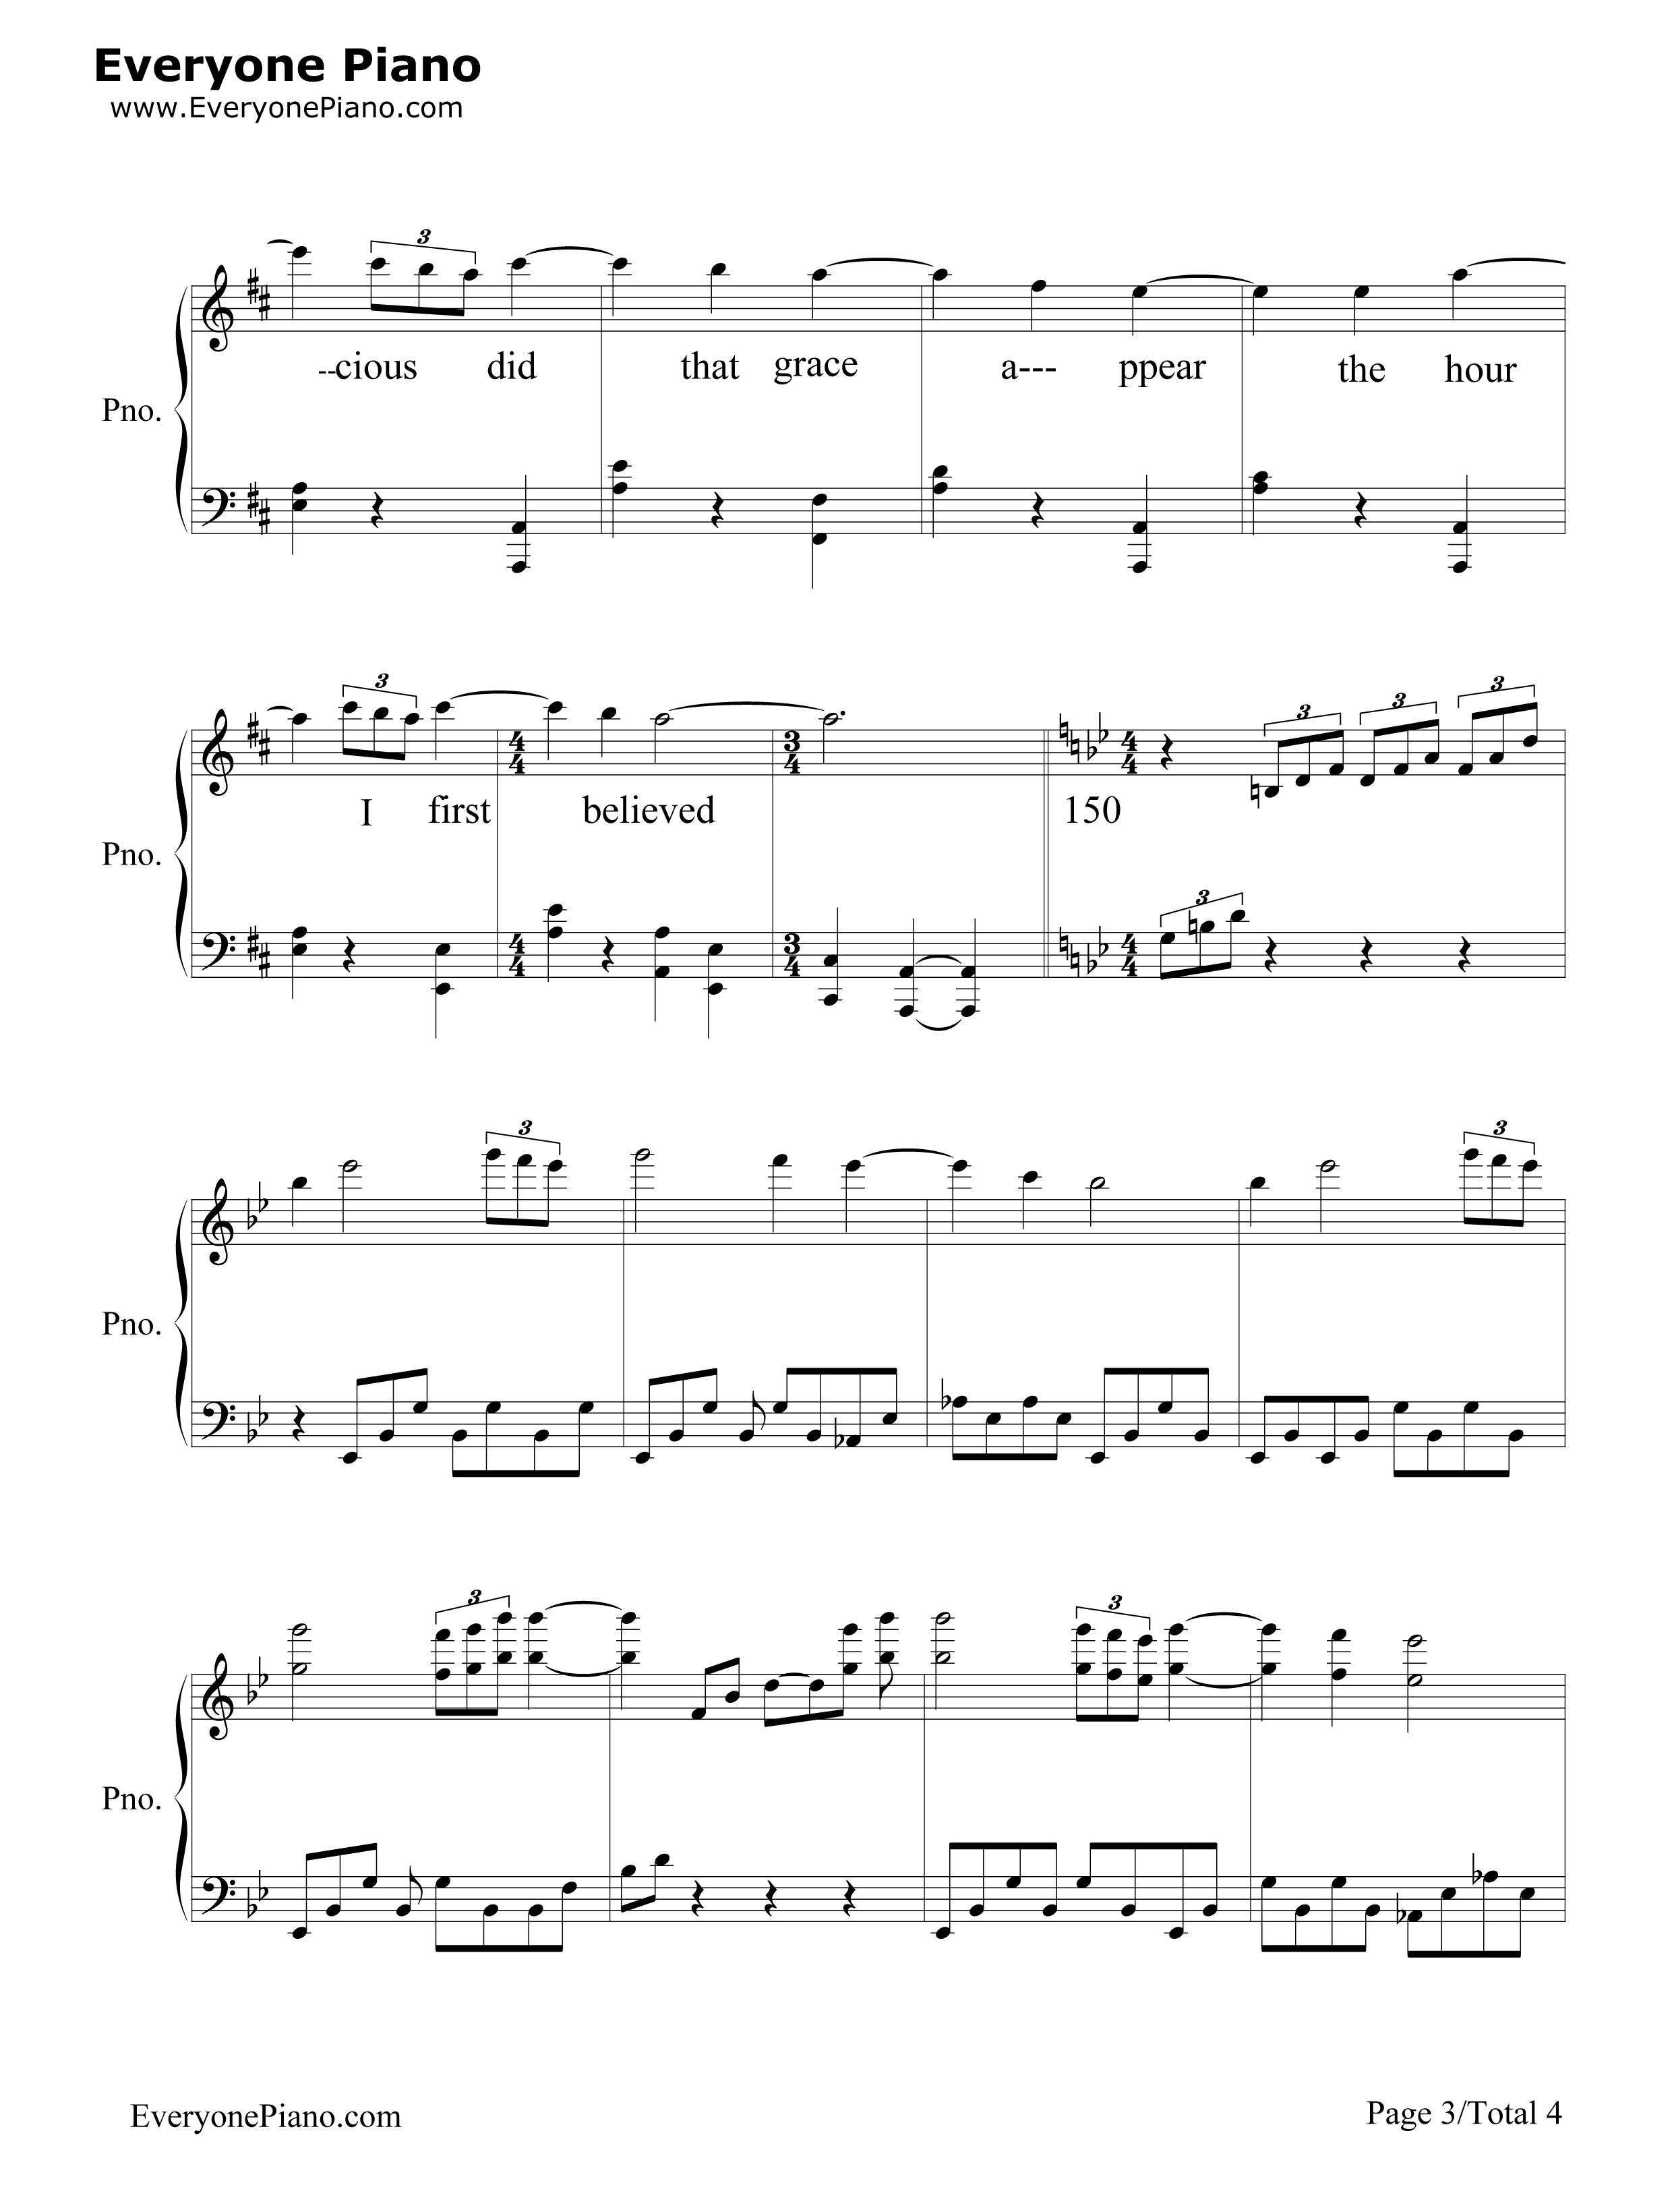 Amazing grace john newton stave preview 3 free piano sheet music listen now print sheet amazing grace john newton stave preview 3 hexwebz Image collections